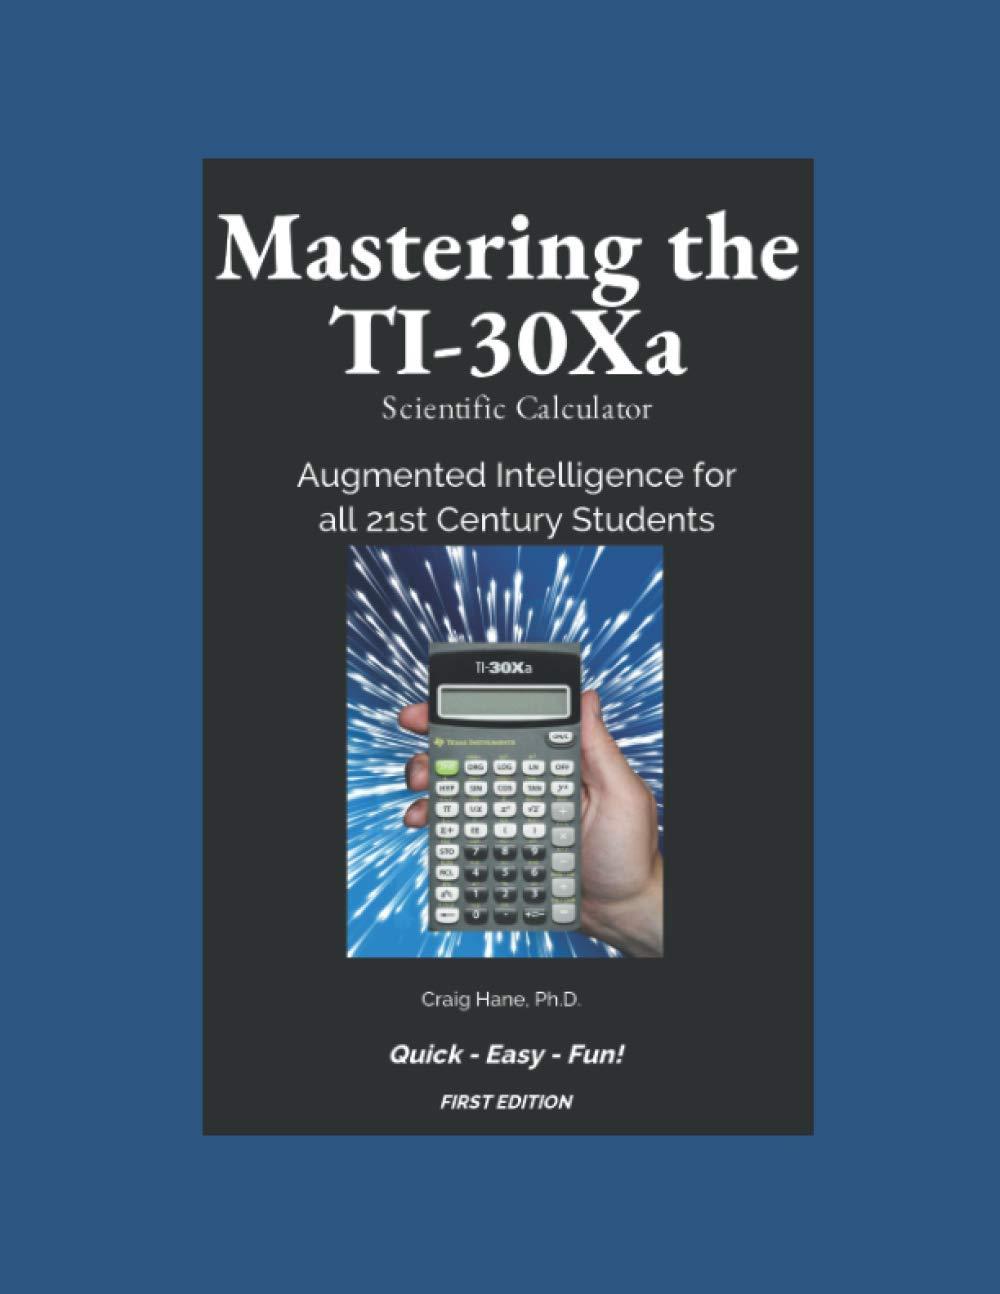 Amazon.com: Mastering the TI-30Xa Scientific Calculator: Augmented  Intelligence for all 21st Century Students (9798651171323): Hane Ph.D.,  Craig: Books